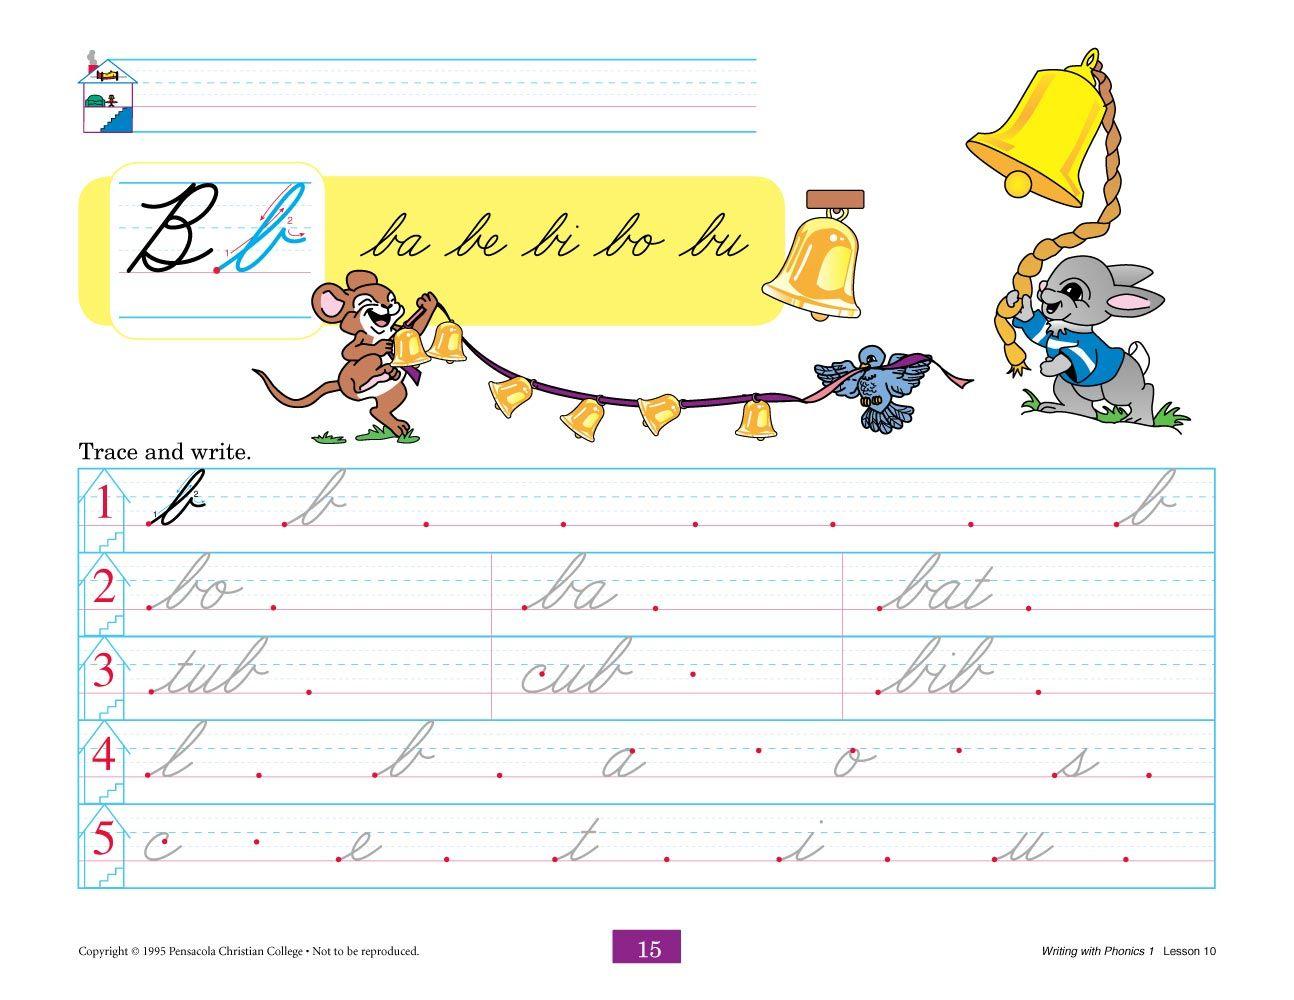 medium resolution of Abeka   Product Information   Writing with Phonics 1 Cursive   Writing  worksheets